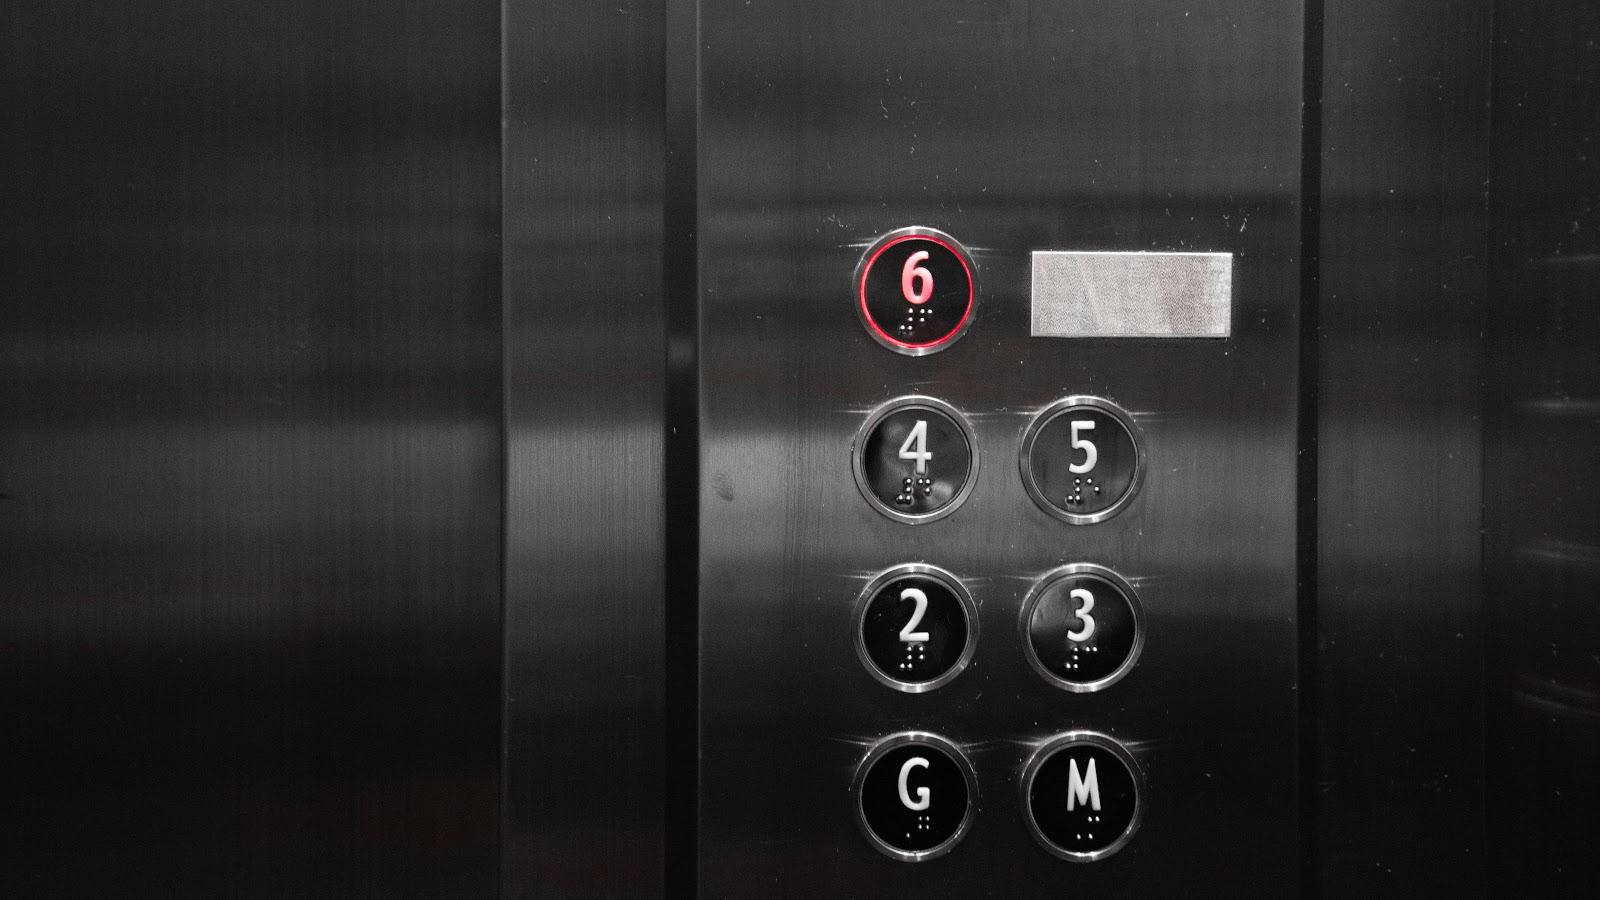 skz3K3aATFCJMqdsqq J7m74aB6Zg9uWMX91X1SXyRN 4Ohq6R62X8g5RapYy5 fxwsScT8zPw9G r2O5JFOuSb0PG5iDGUTIgh0p XhT5q2pg2y1wmbit72cMGldSCNq00EnXgl - Tipos de ascensores para su edificio